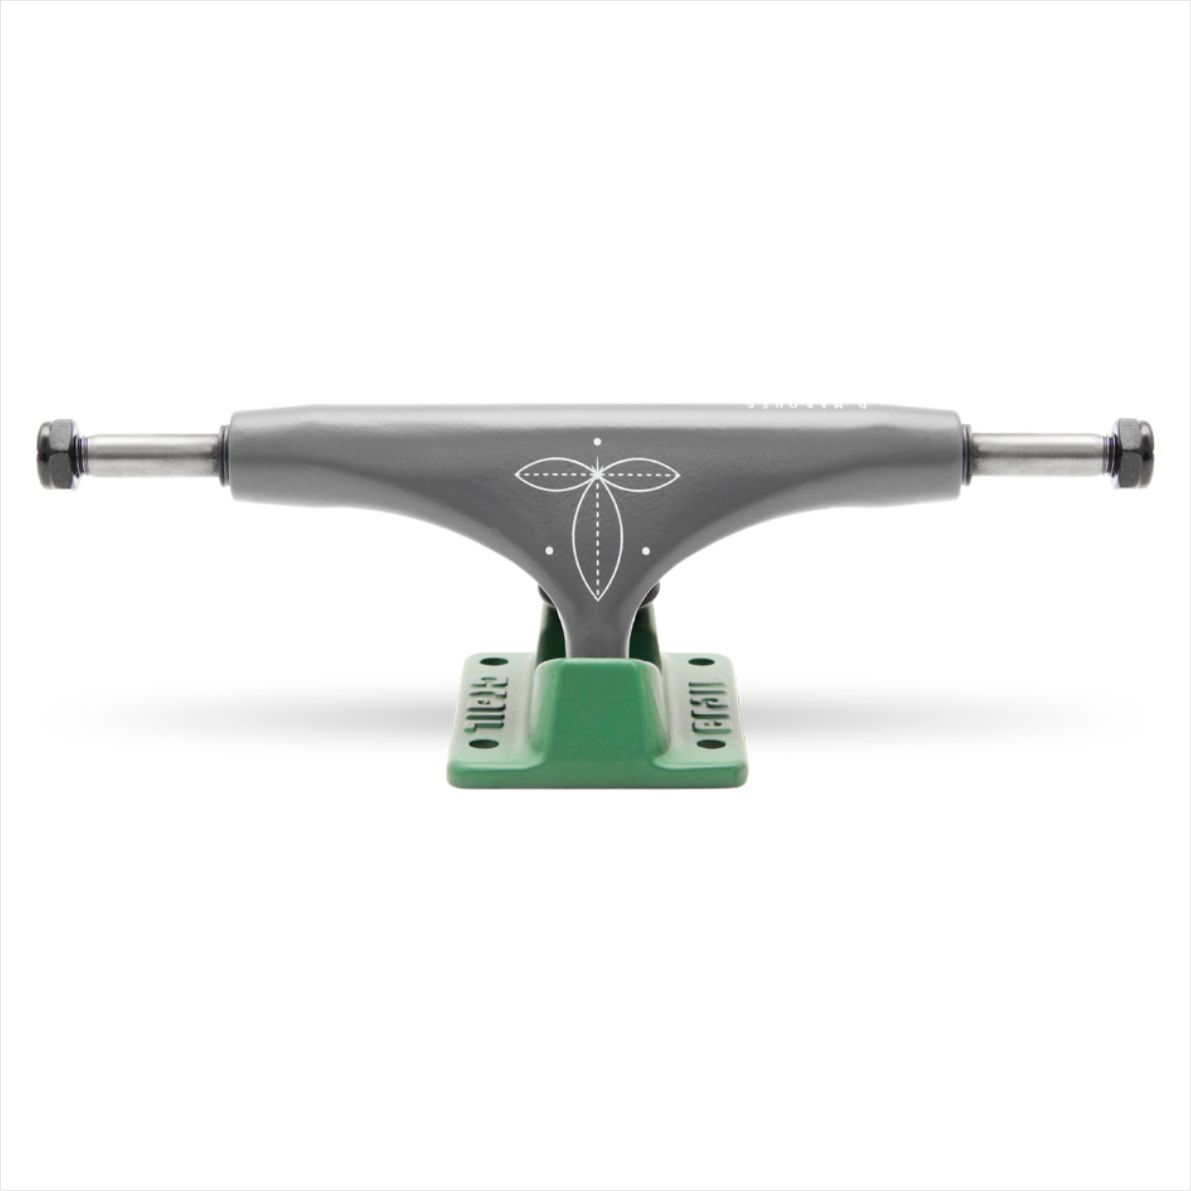 Truck Crail Mid 133 Daniel Marques Green/Grafiti  - No Comply Skate Shop